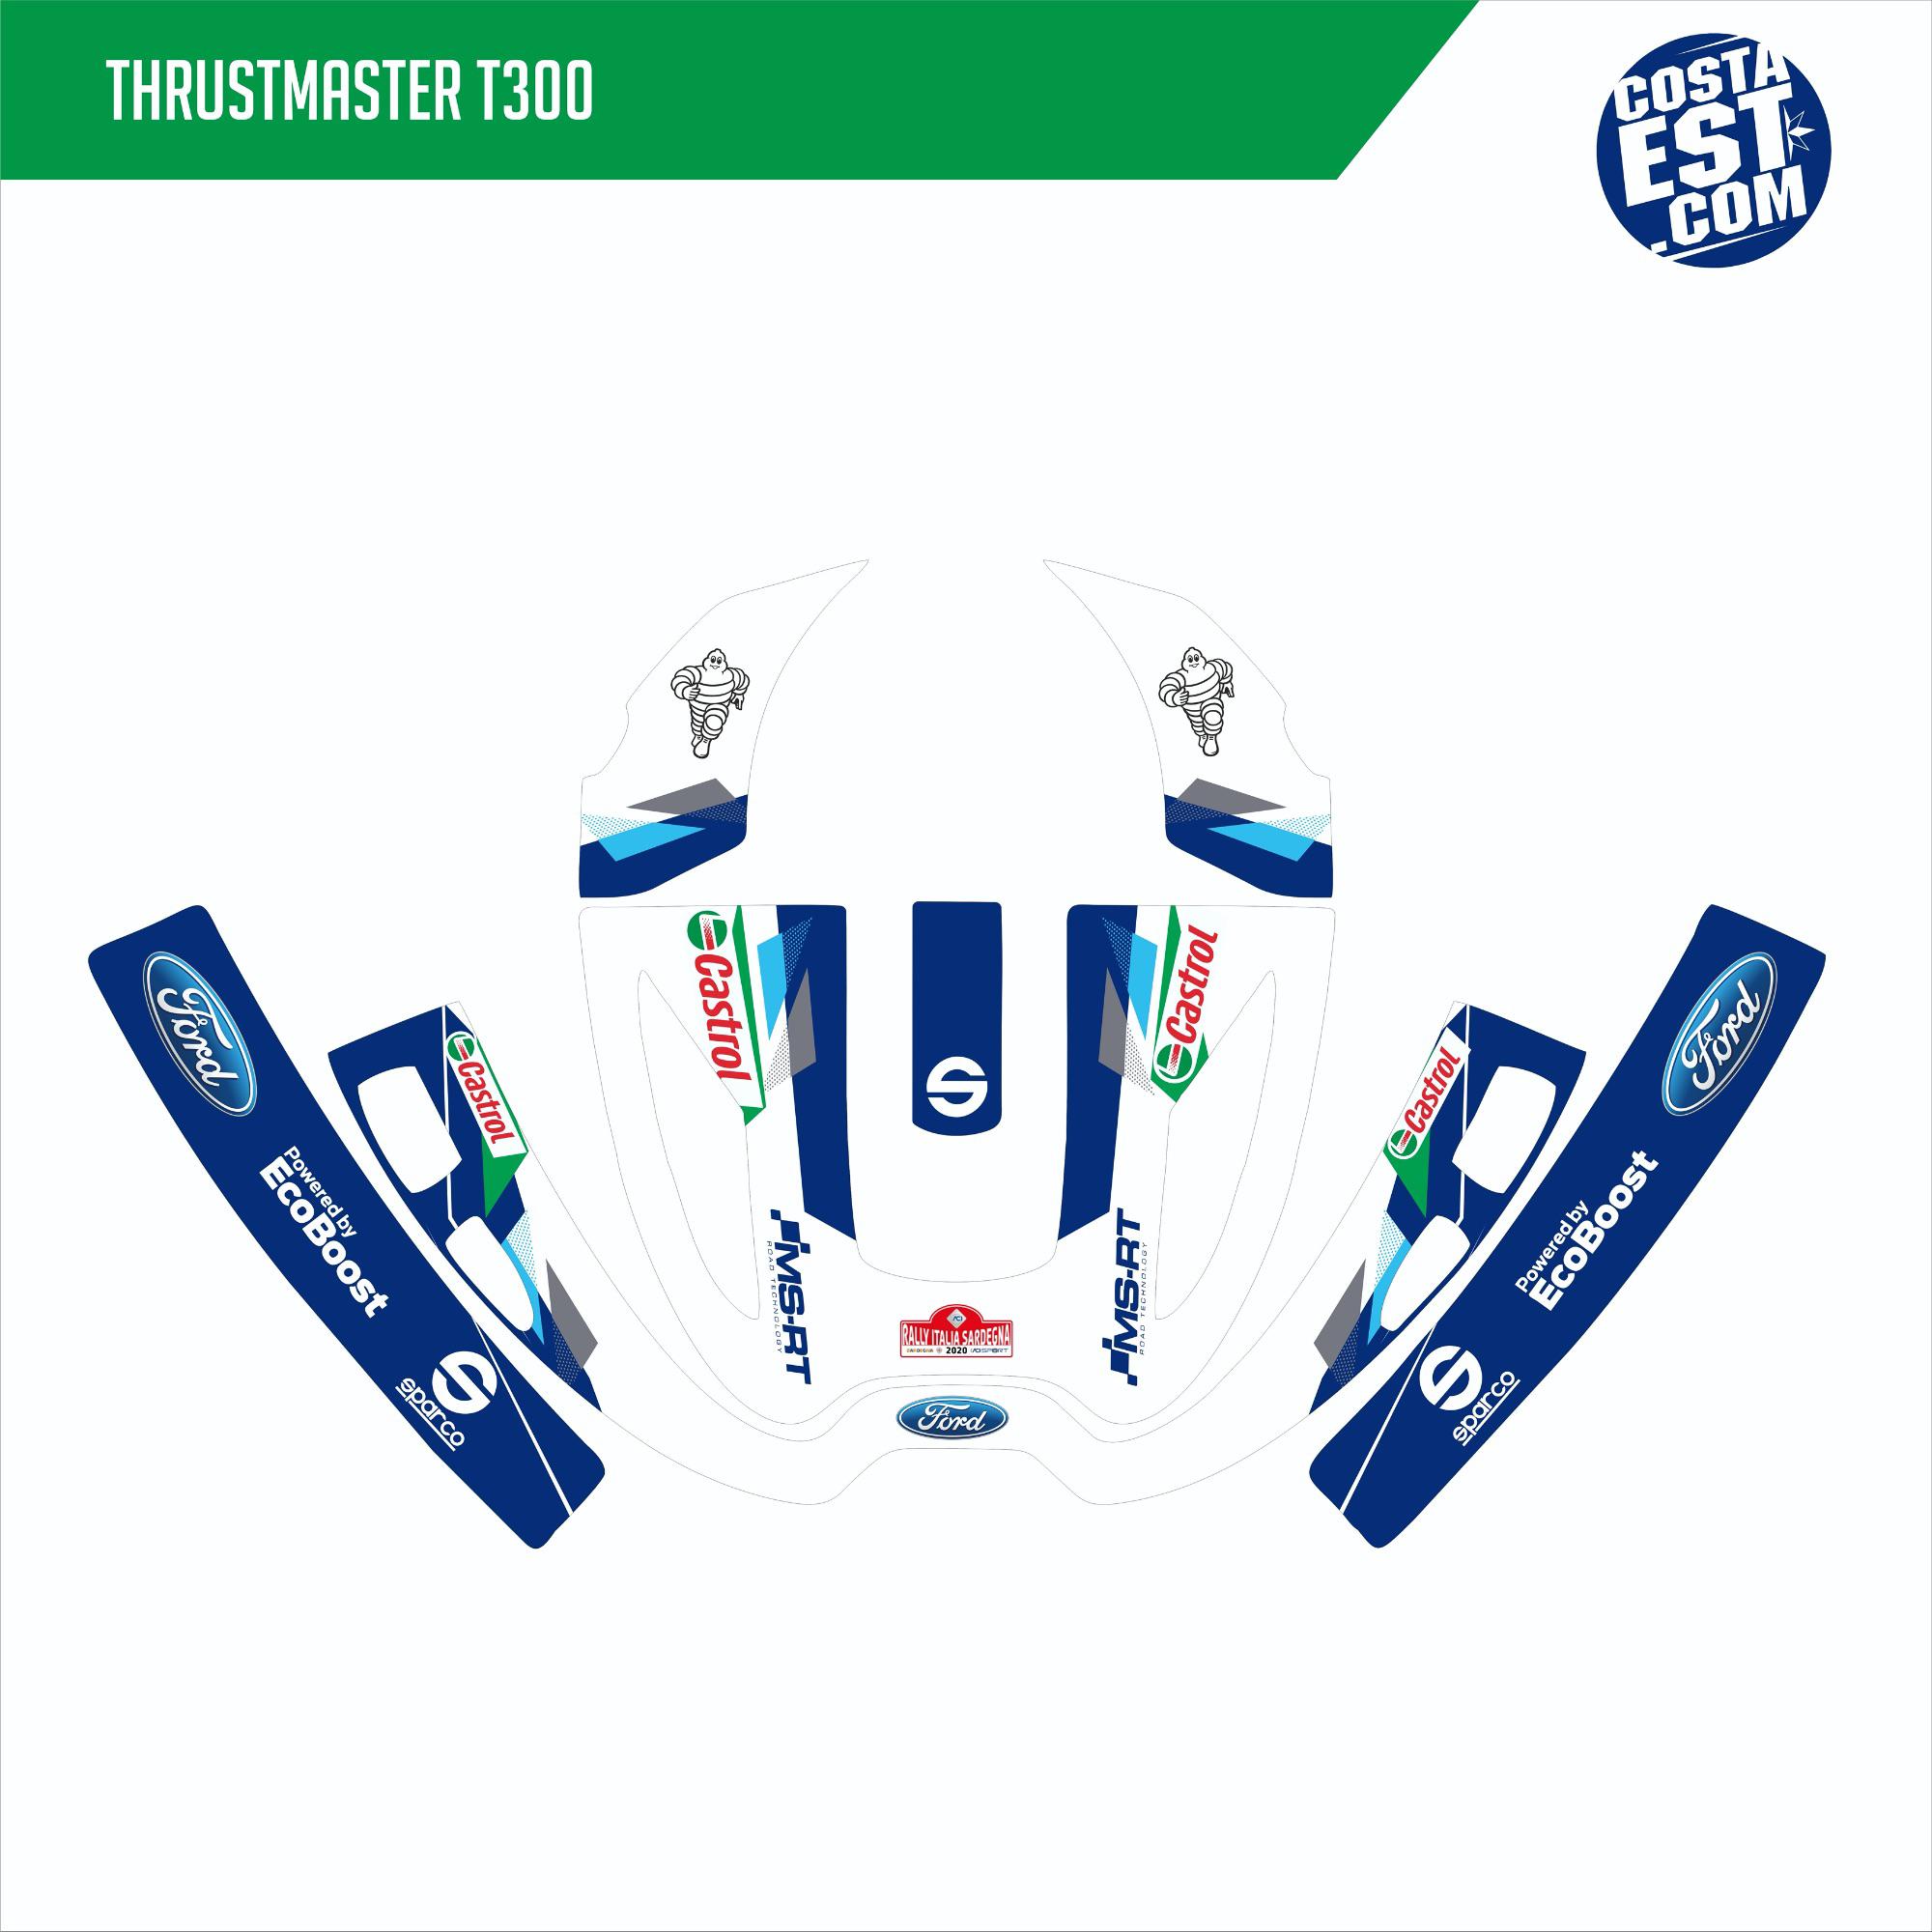 sticker-thrustmaster-t300-replica-ford-wrc